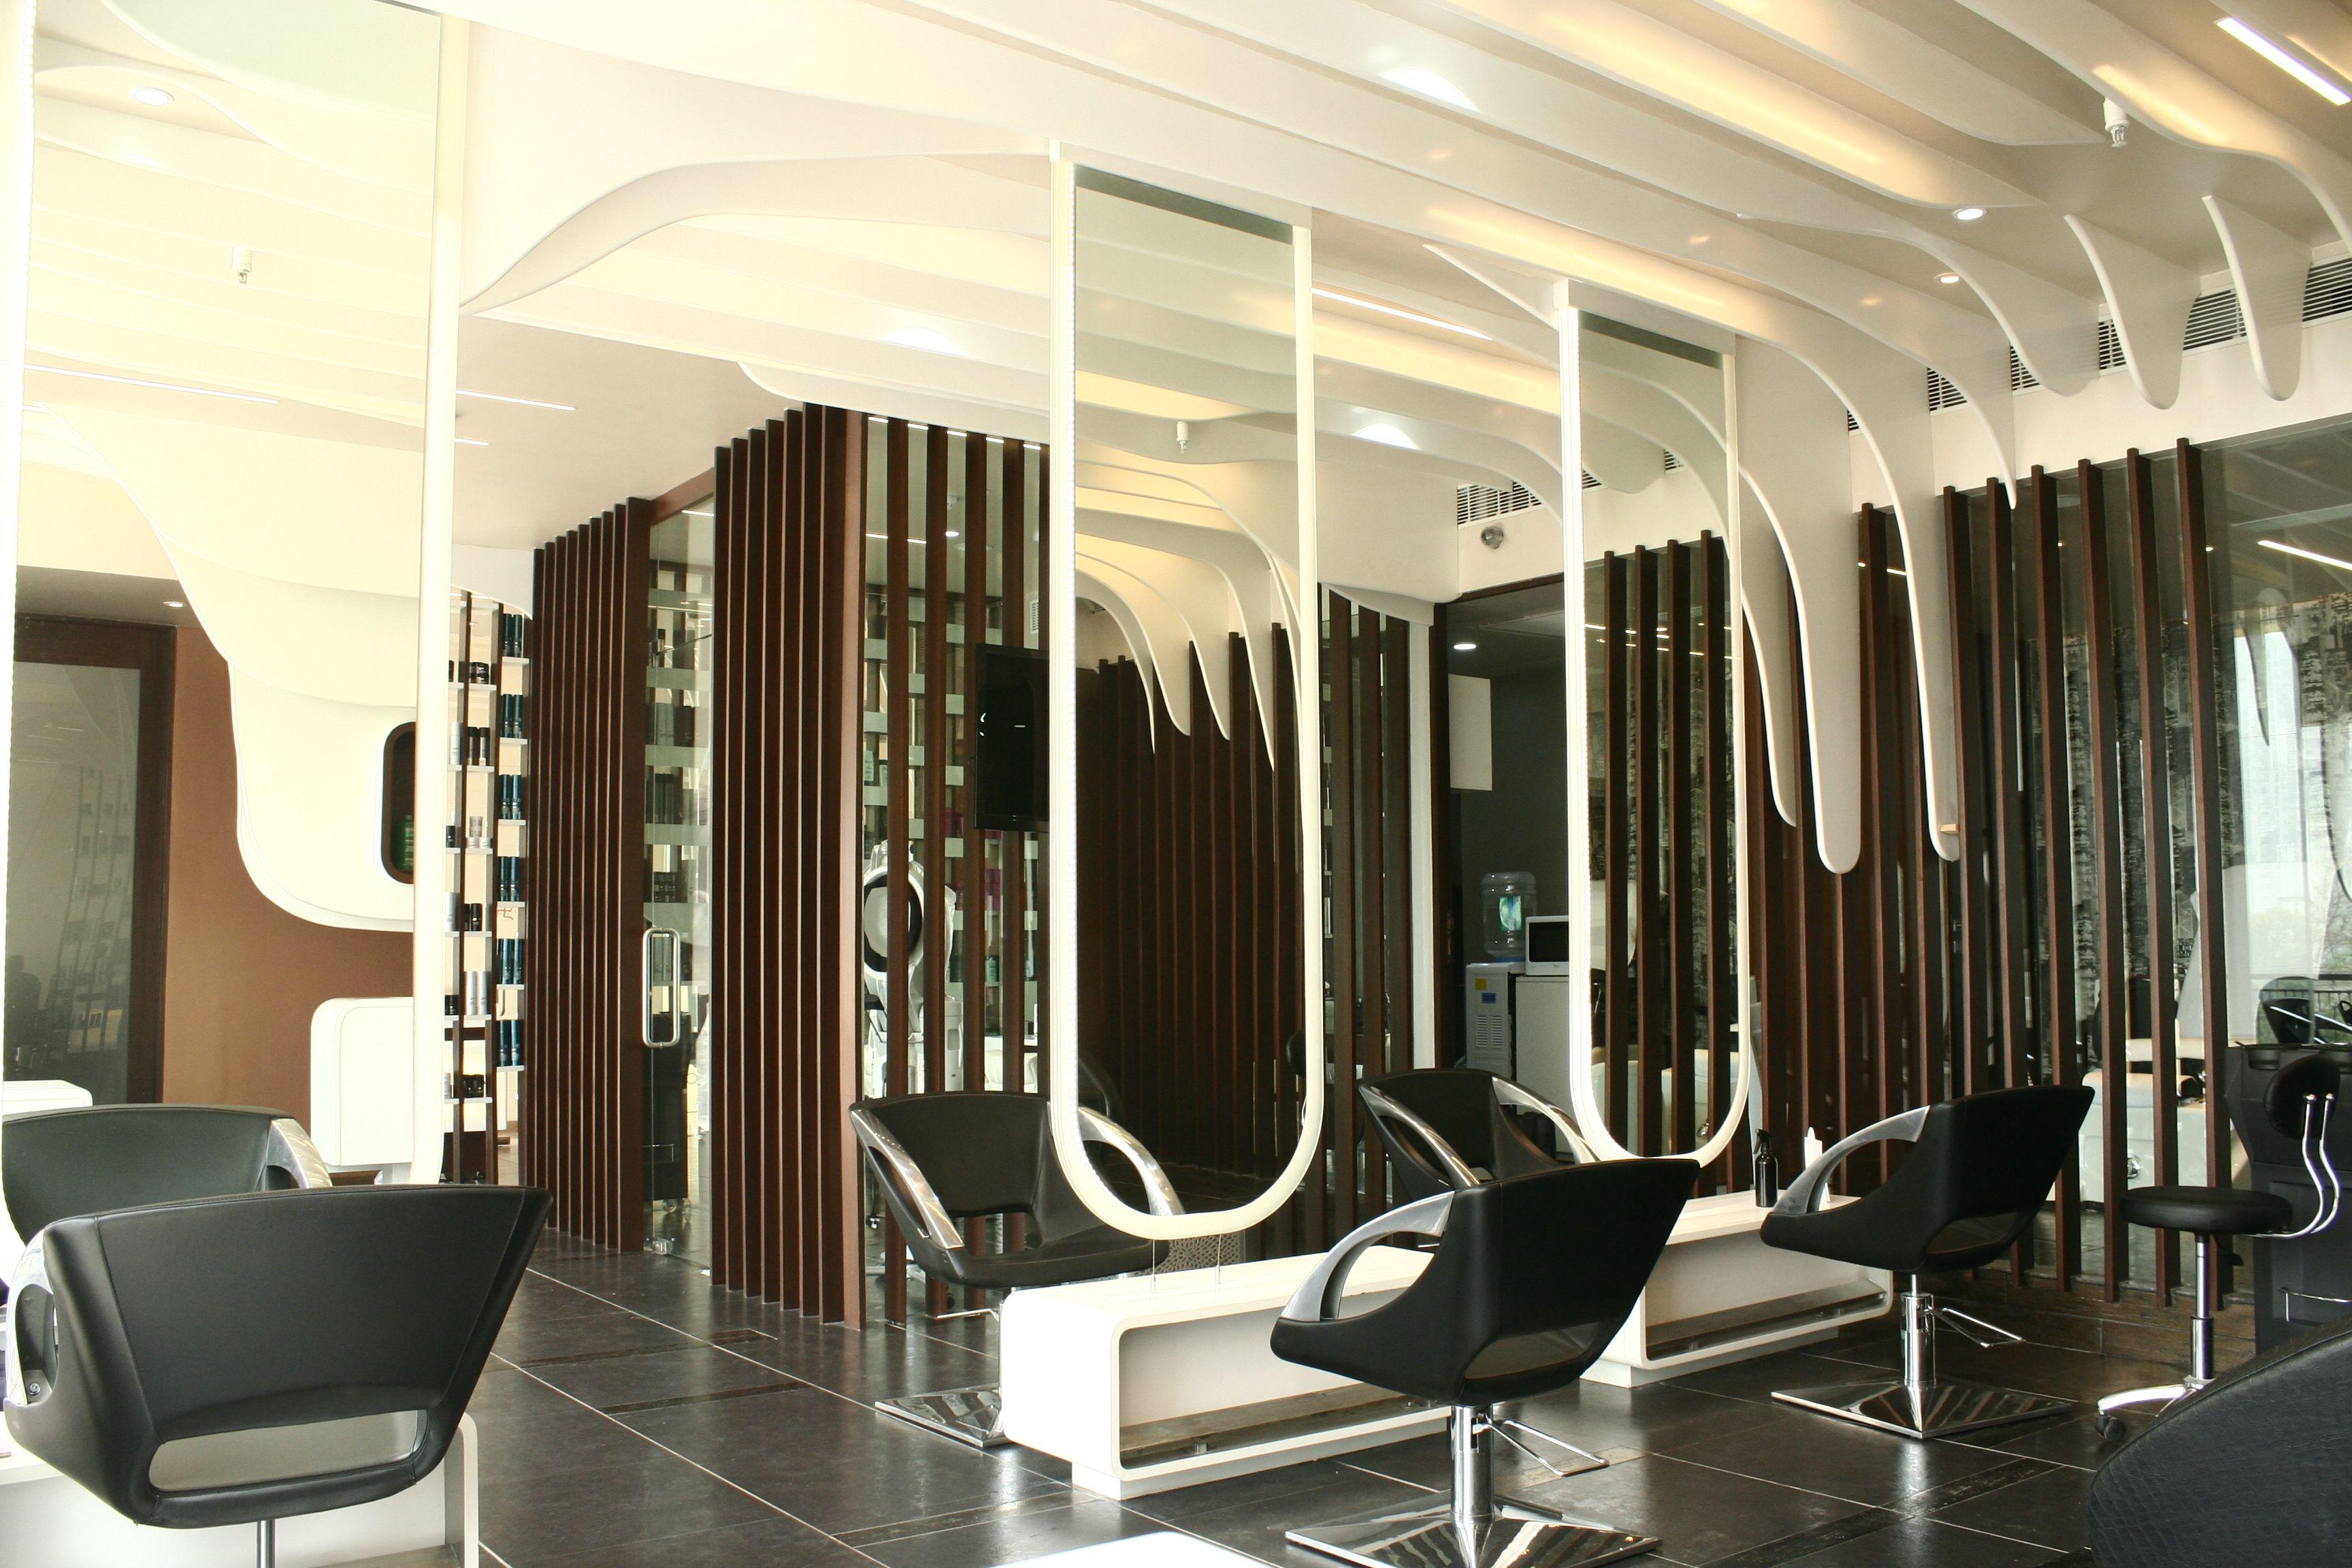 Architecture And Interior Design Projects In India   Toni U0026 Guy Salon At  Gurgaon   Manish